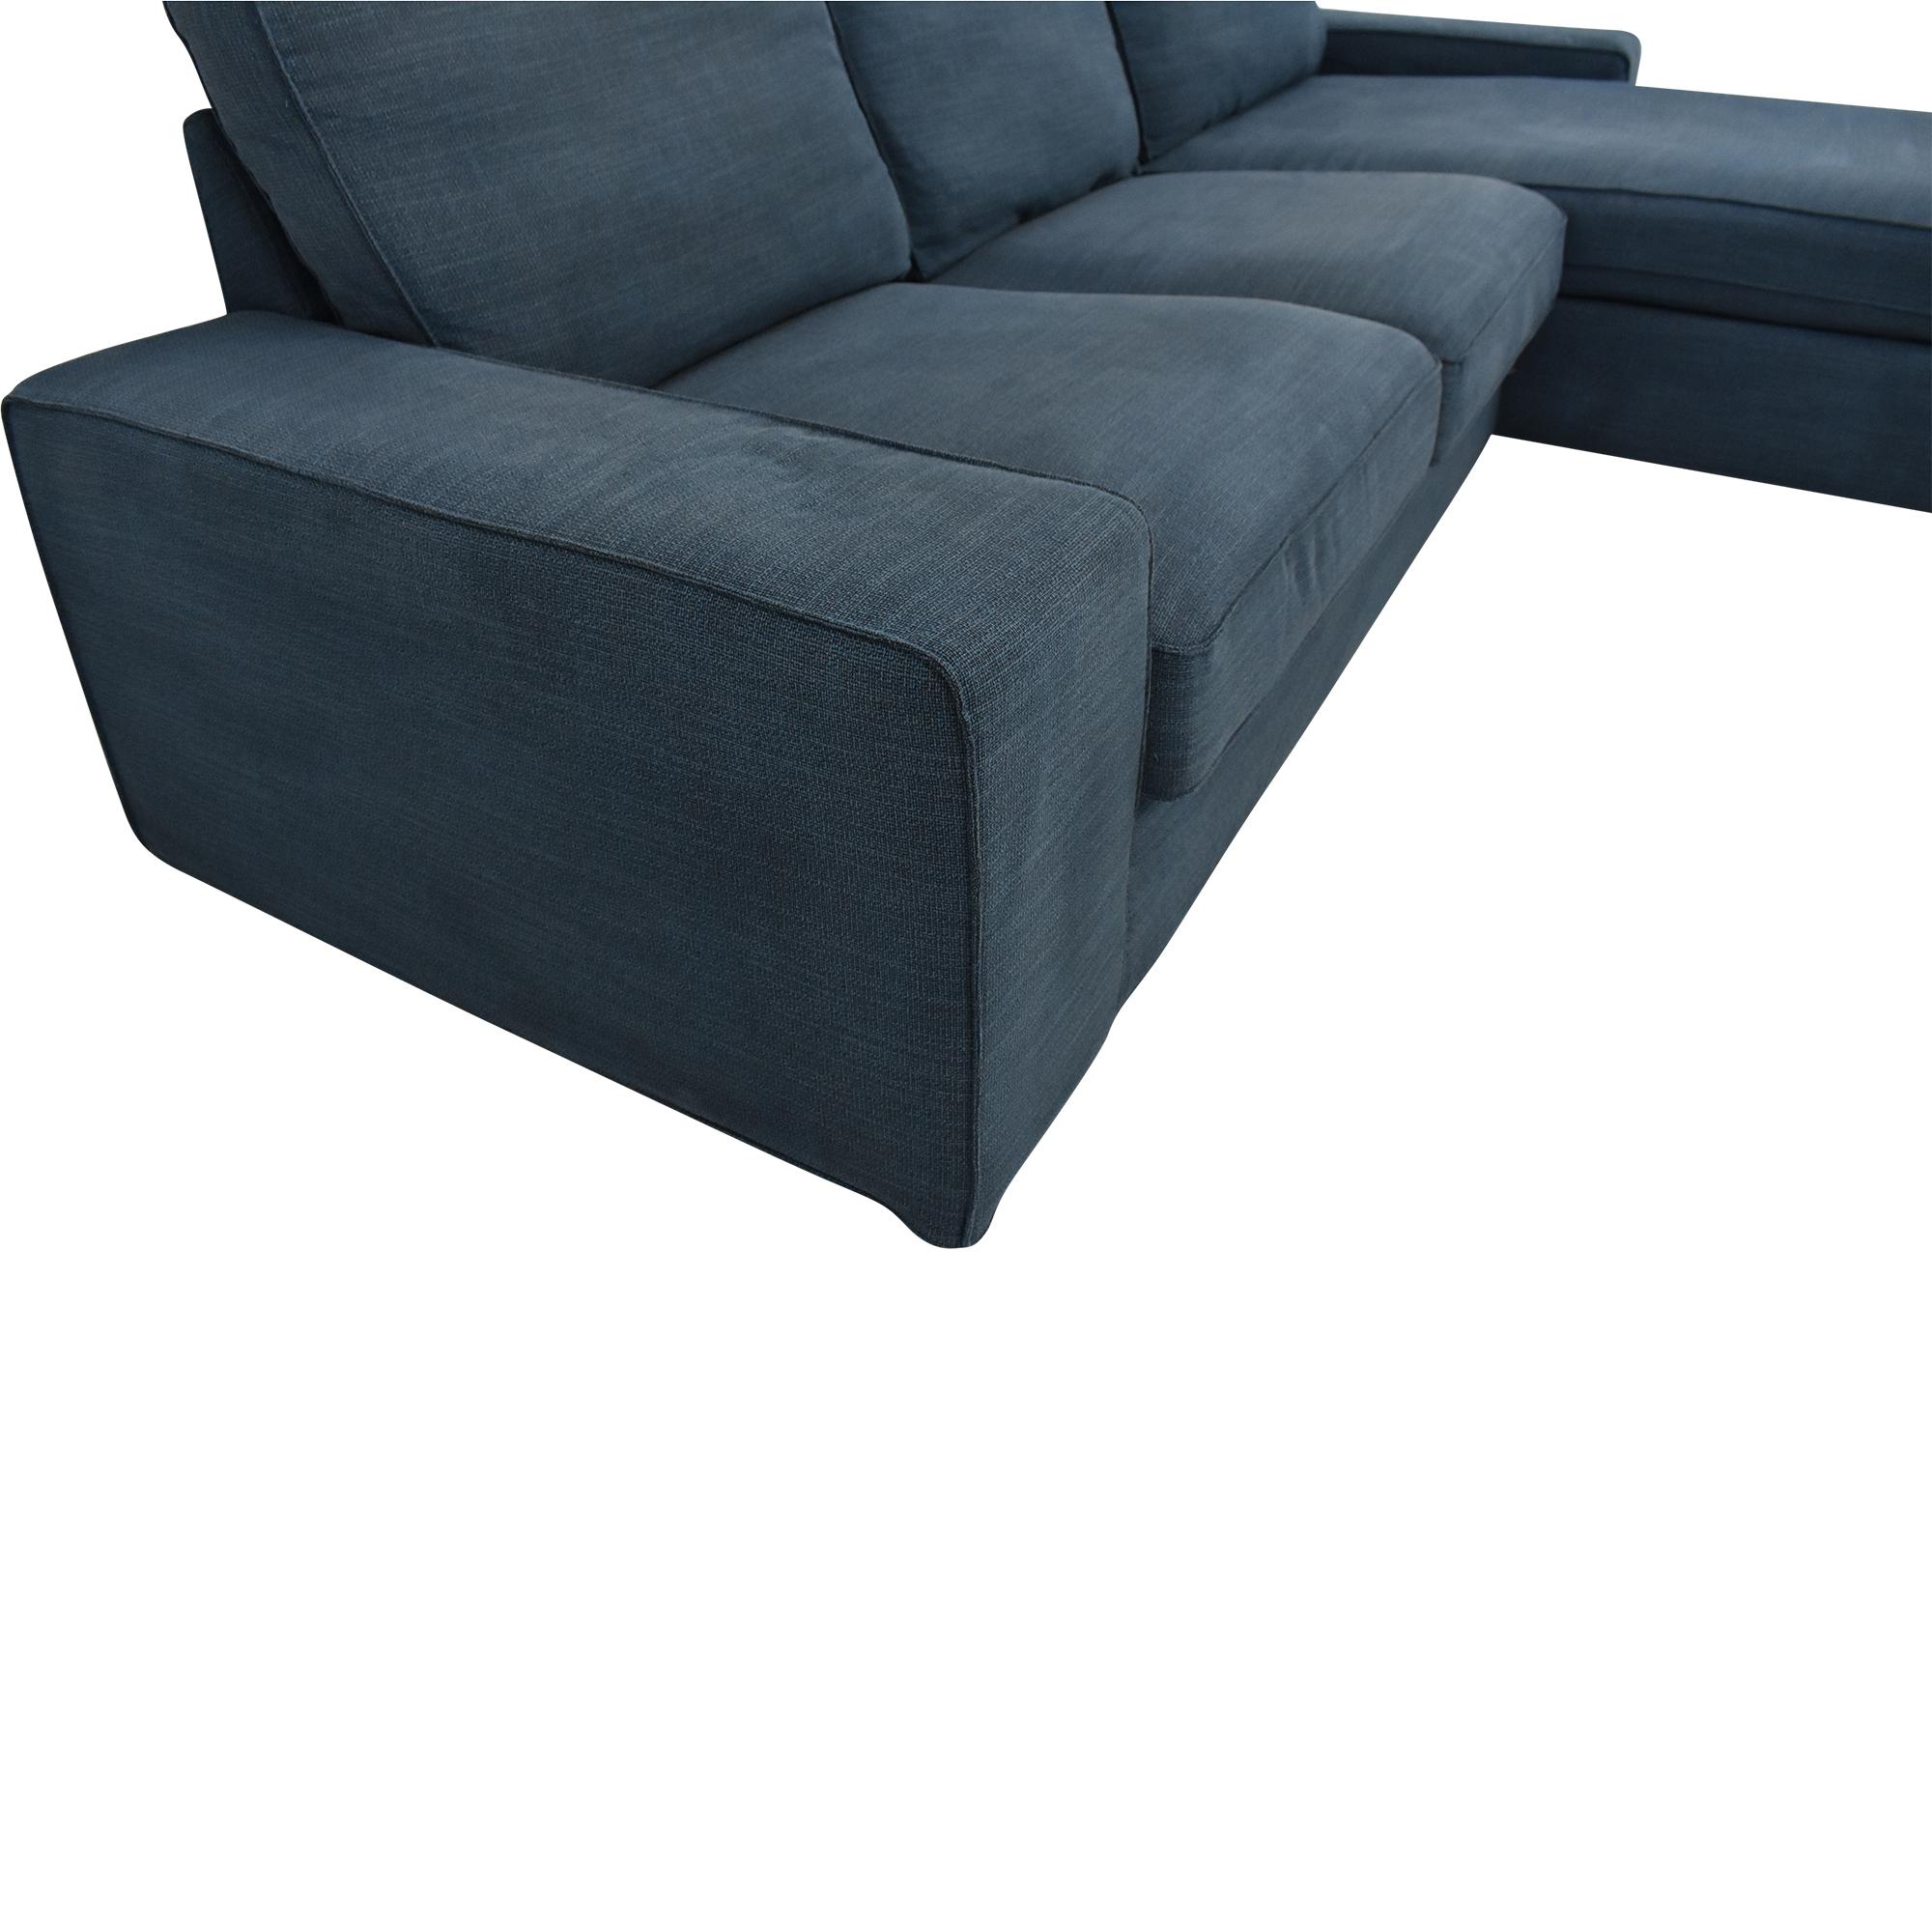 buy IKEA Kivik Sofa with Chaise IKEA Sofas